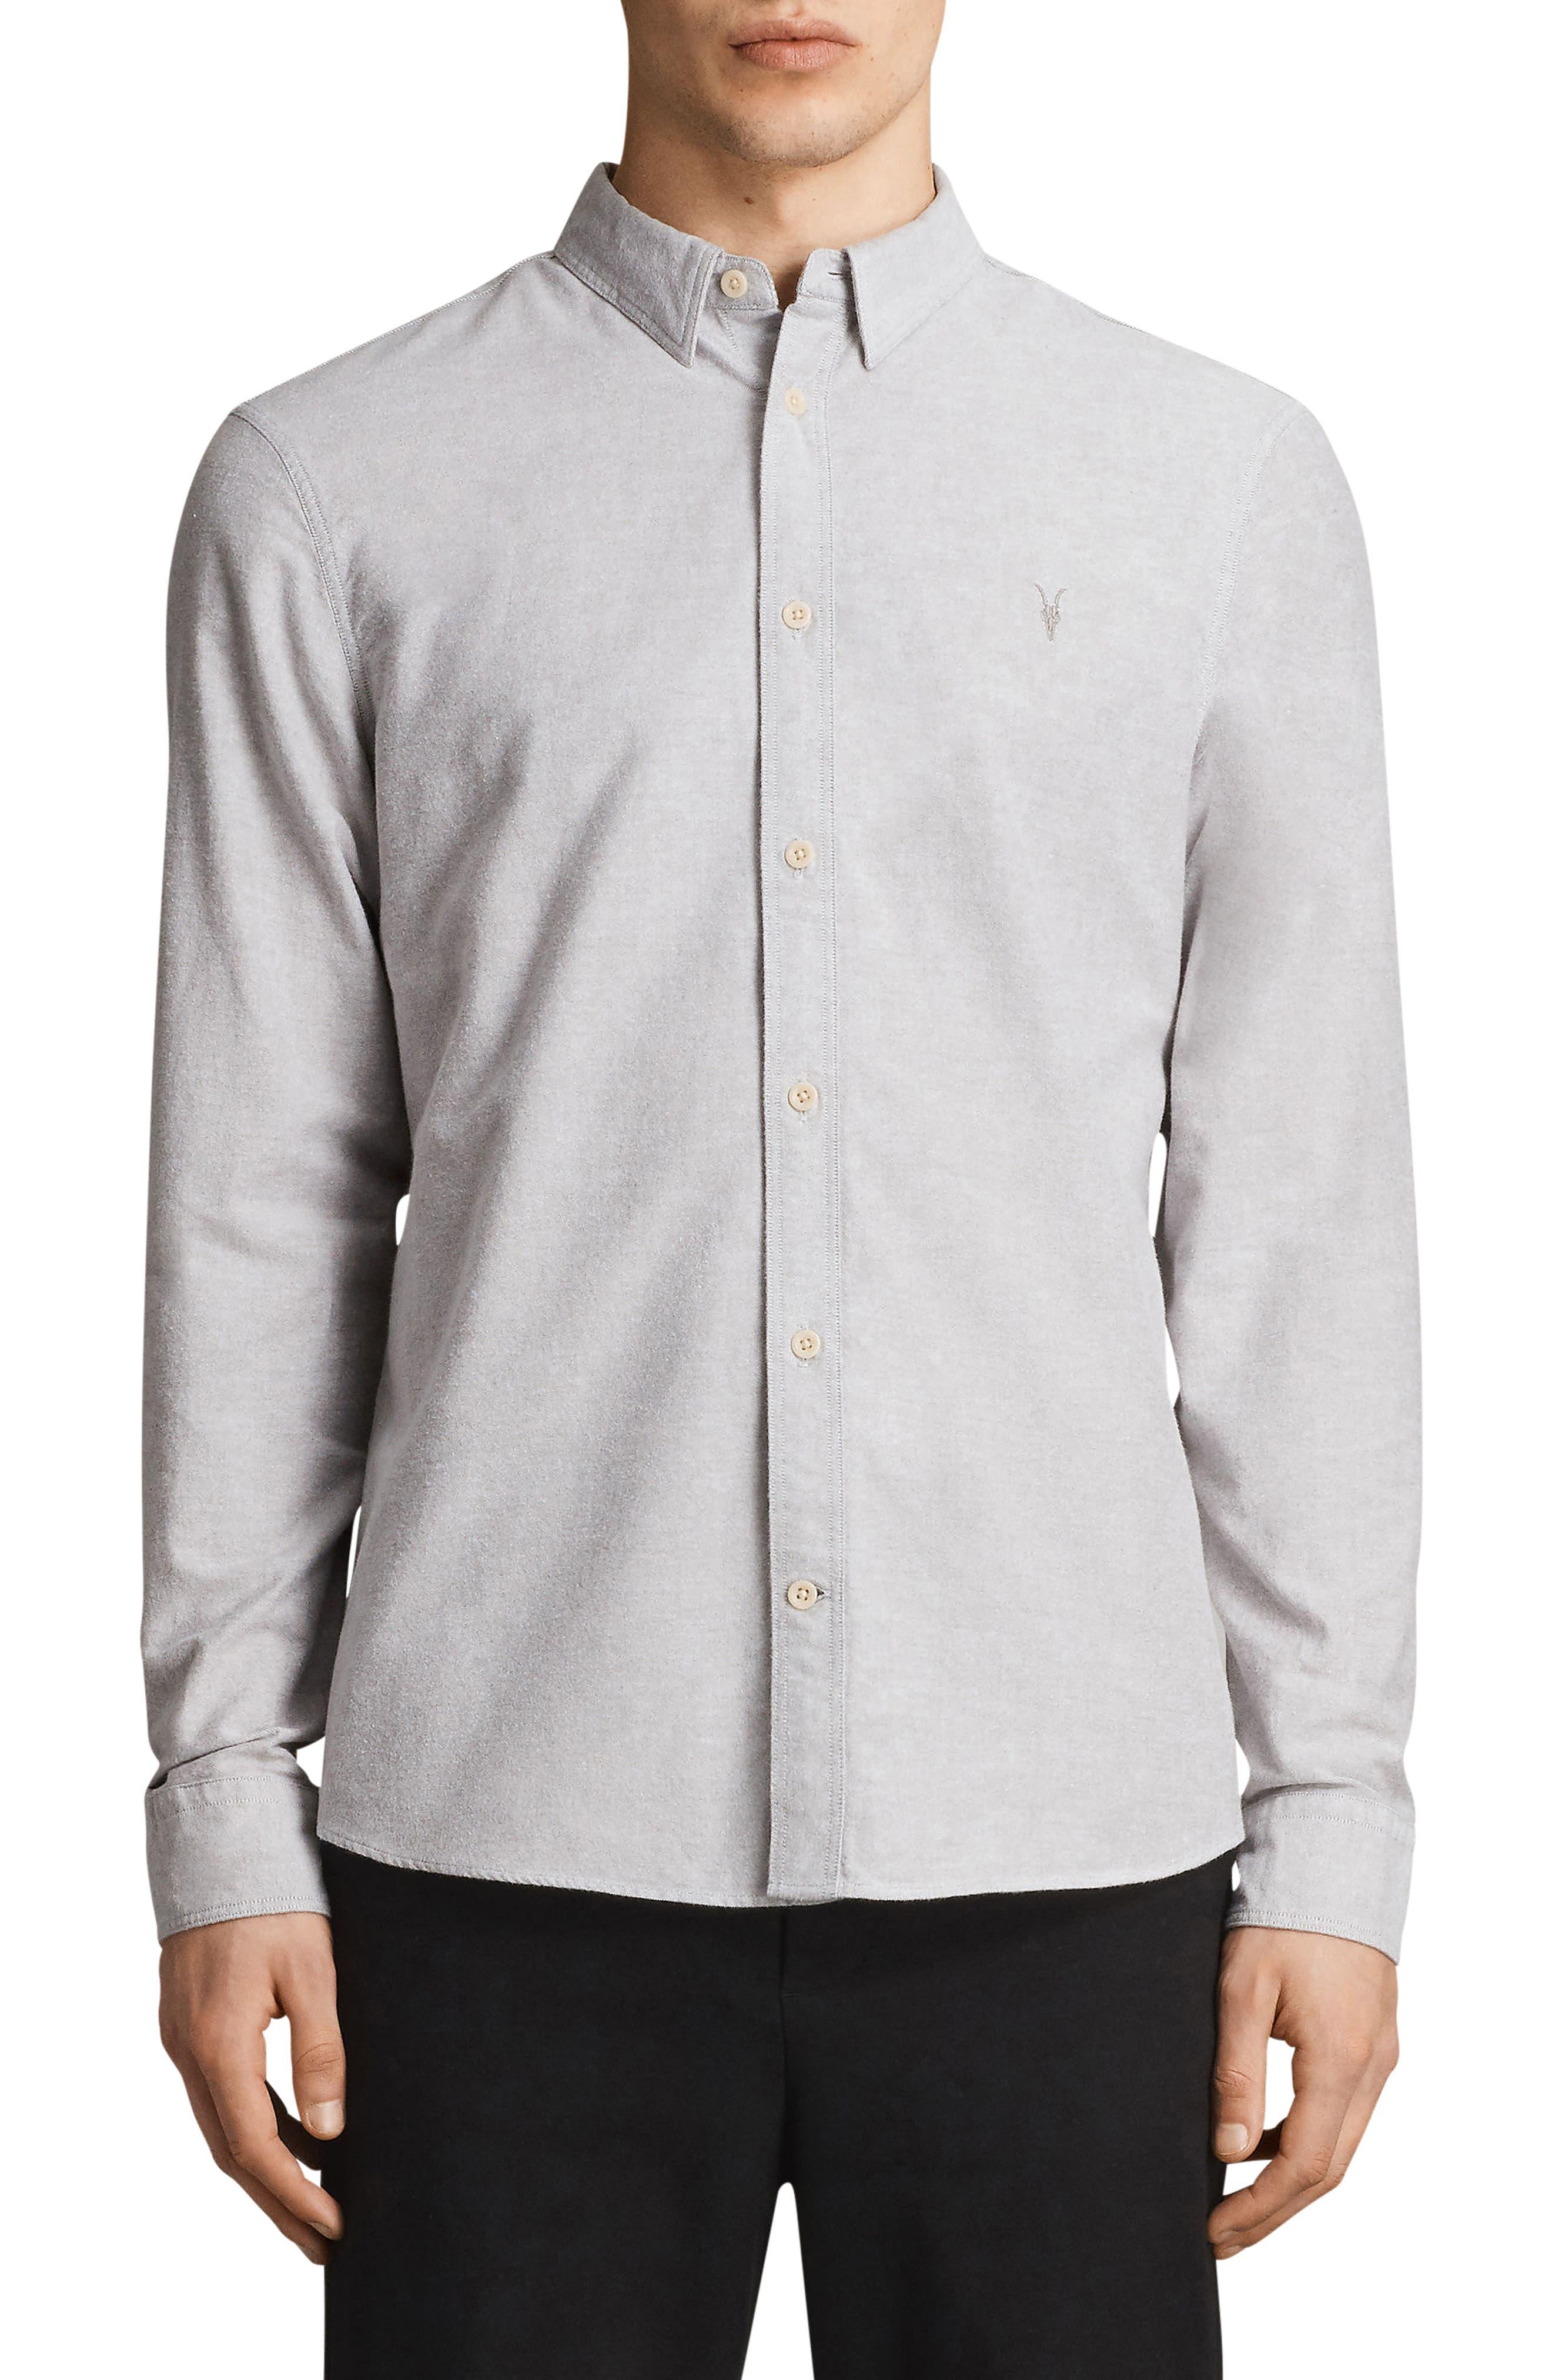 Huntington Regular Fit Sport Shirt,                         Main,                         color, DARK GULL GREY